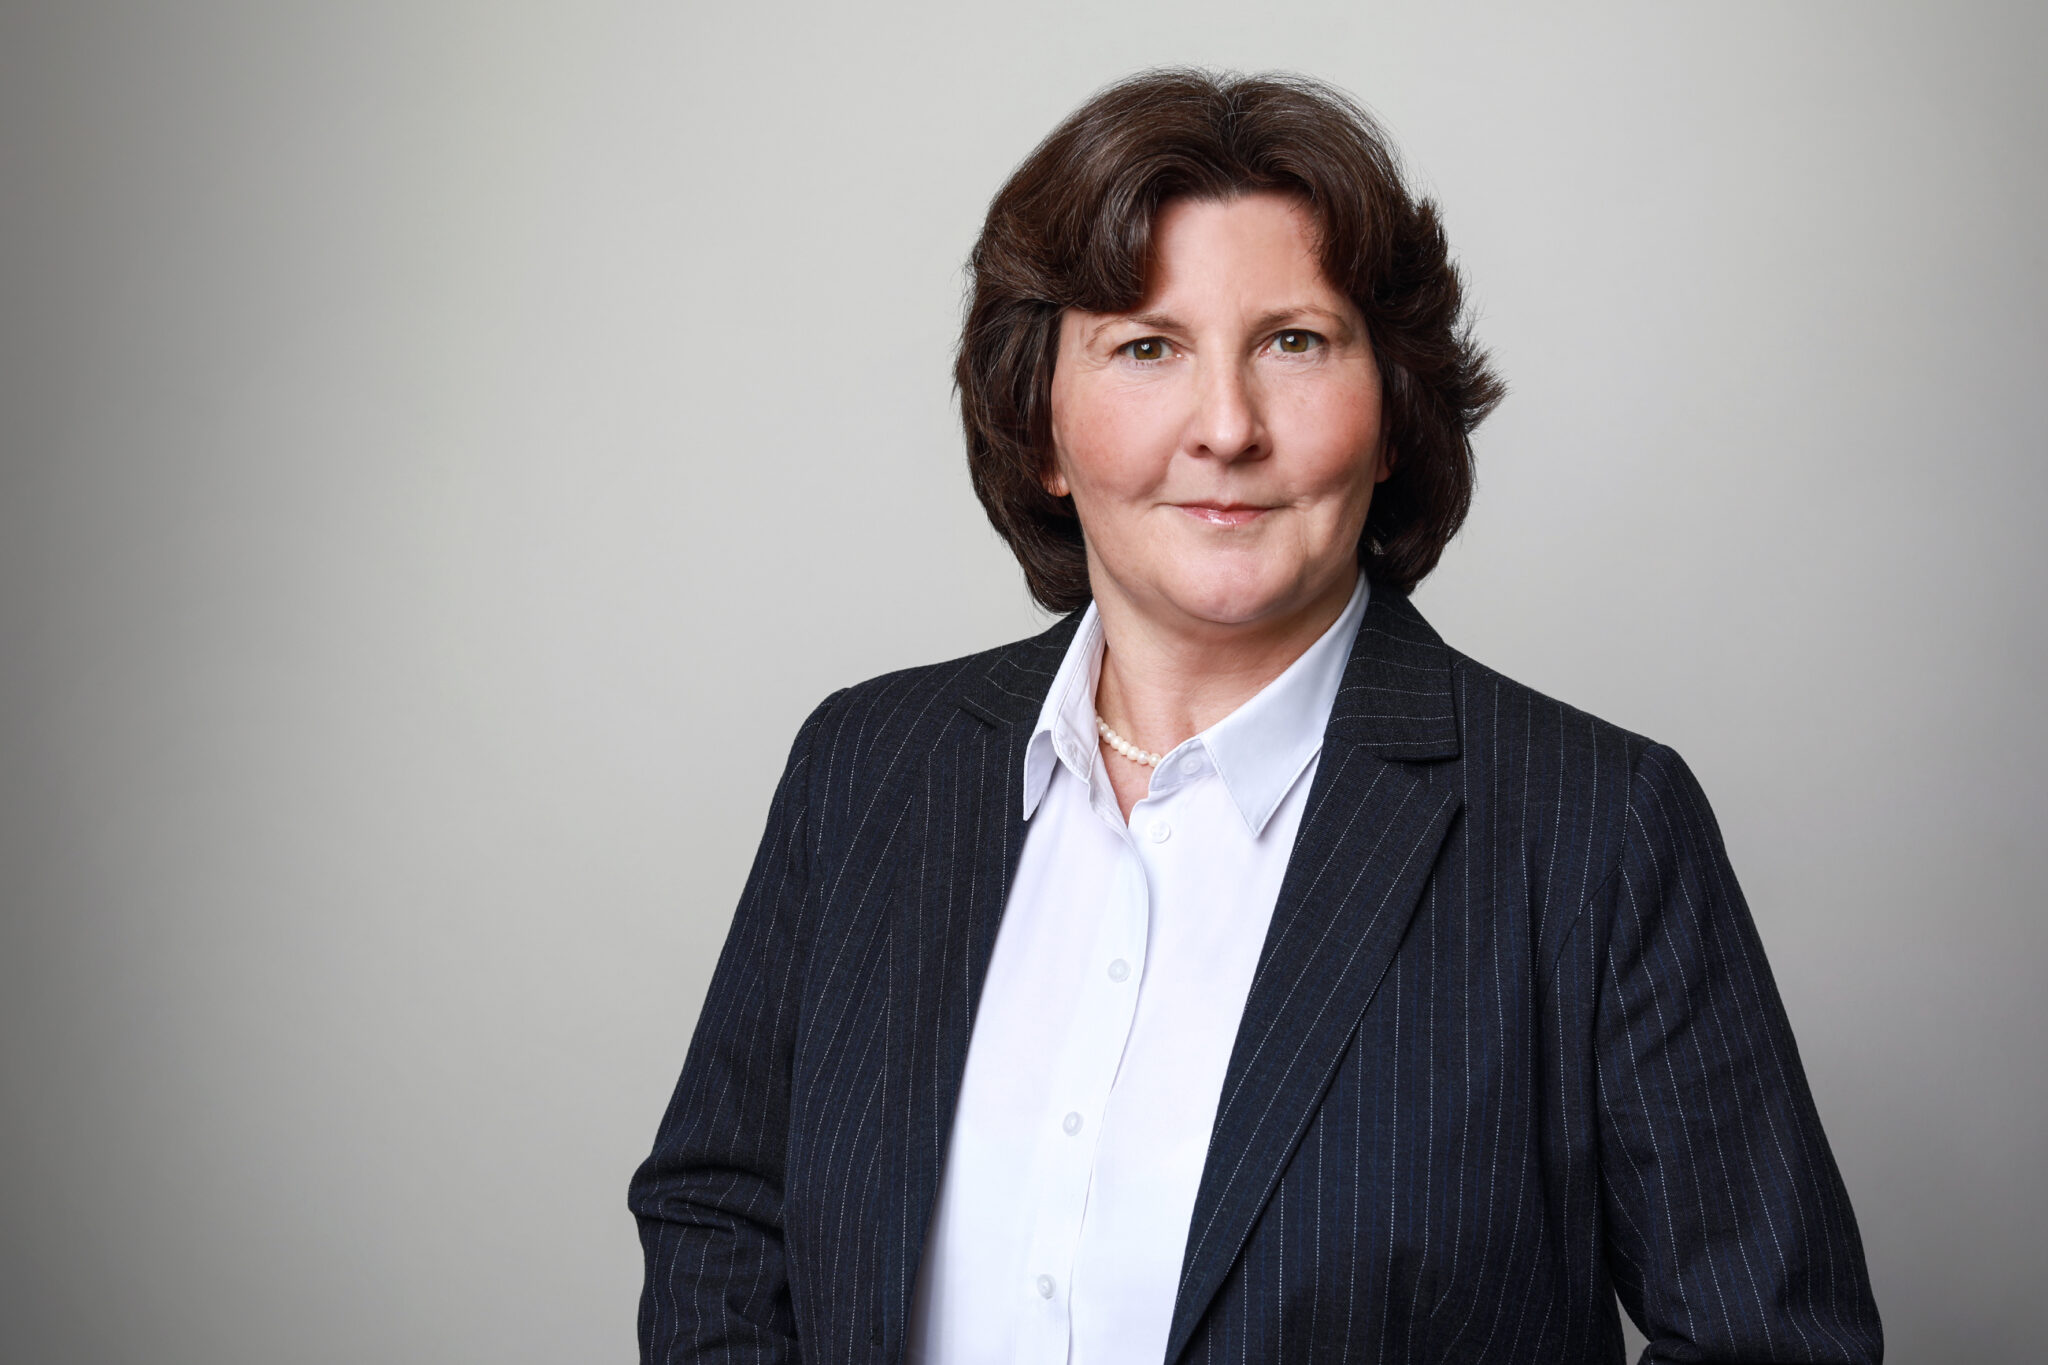 Rechtsanwältin Anke Bläsi-Berg, Scheidungsanwältin